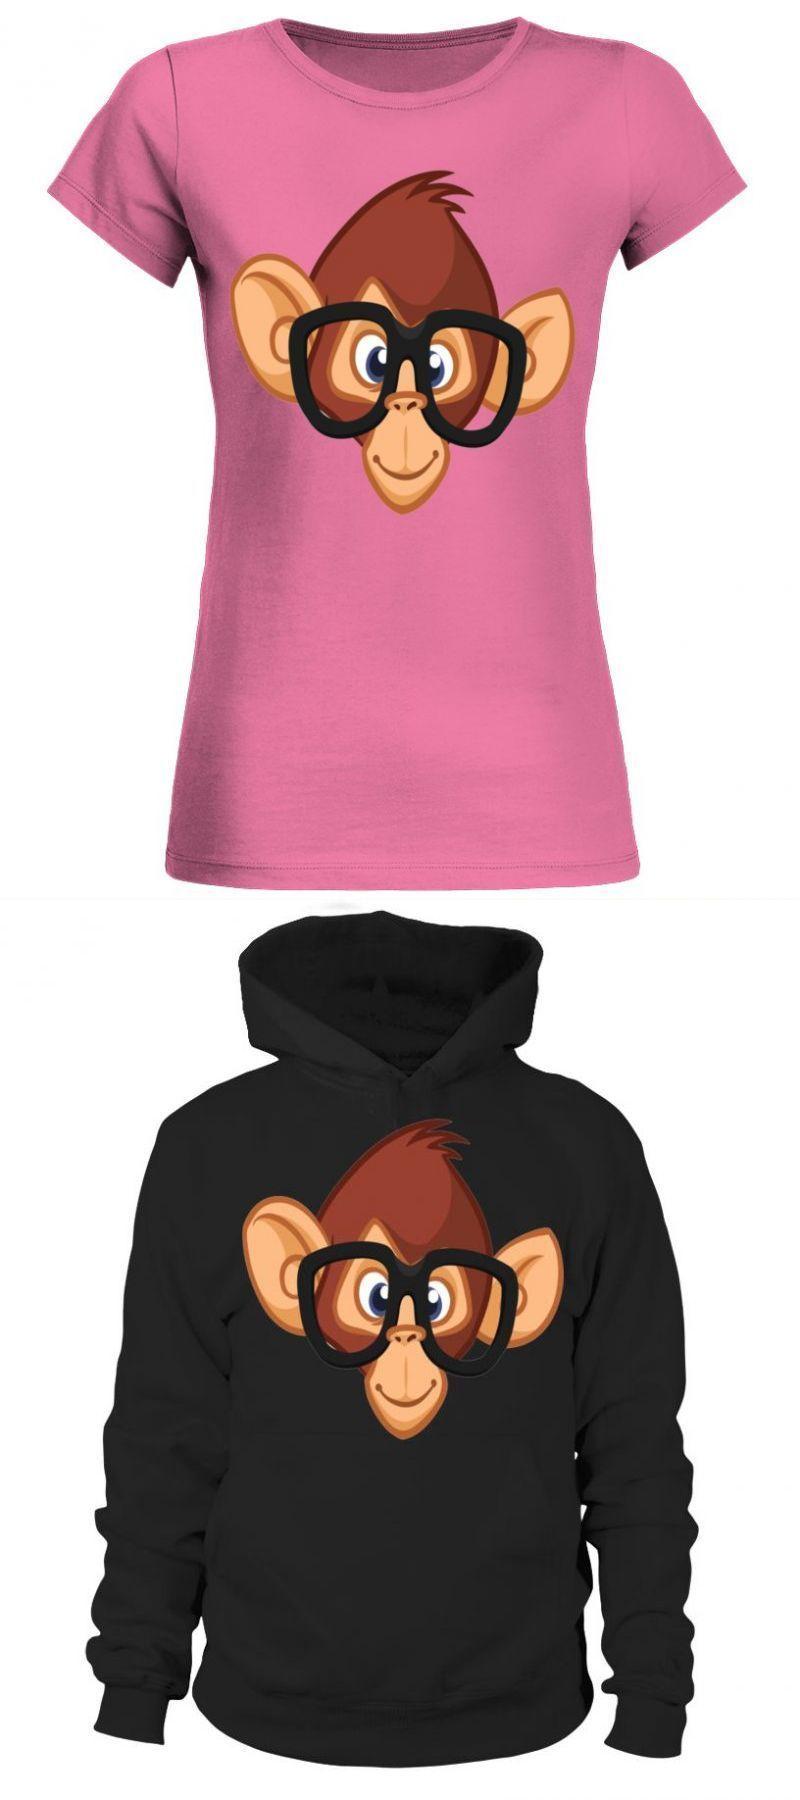 Happy monkey head wearing glasses icon o gas monkey garage t shirt #gasmonkeygarage Happy monkey head wearing glasses icon o gas monkey garage t shirt #happy #monkey #head #wearing #glasses #icon #gas #garage #shirt #costume #round #neck #t-shirt #woman #hoodie #unisex #gasmonkeygarage